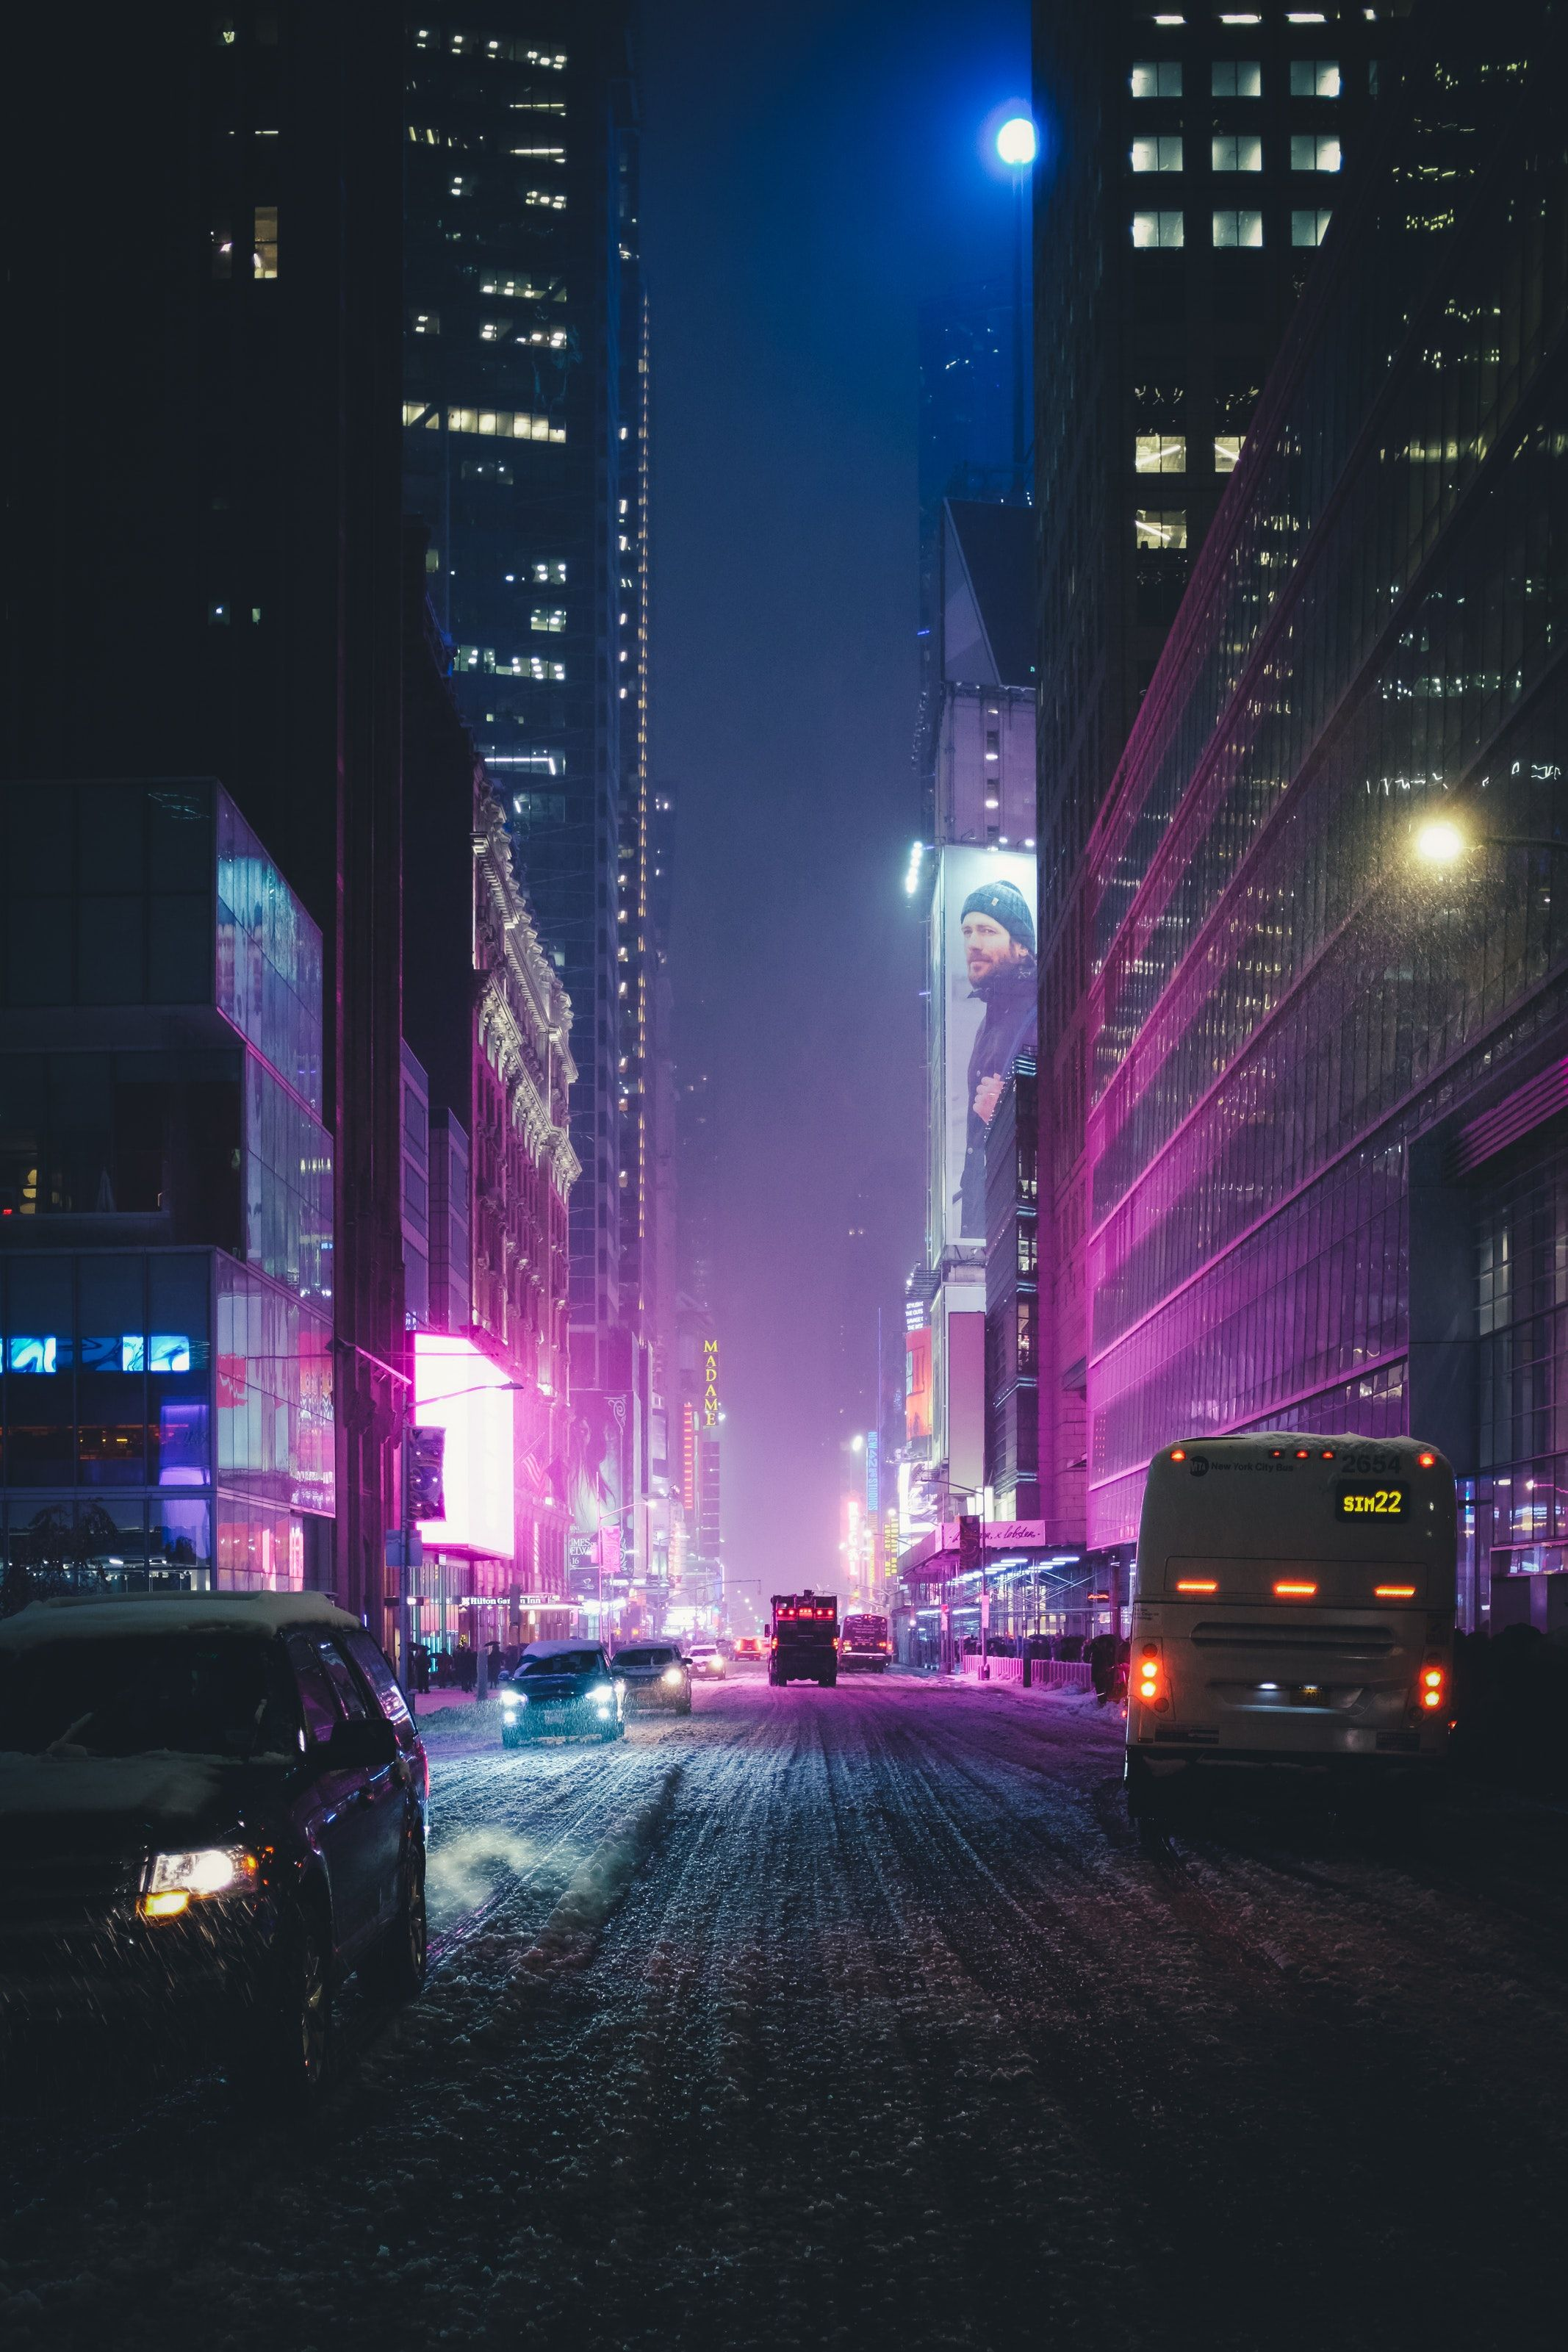 Neon New York Under The Snow Photo By Stephan Valentin Valentinsteph On Unsplash Neon Photography City Wallpaper Neon Wallpaper